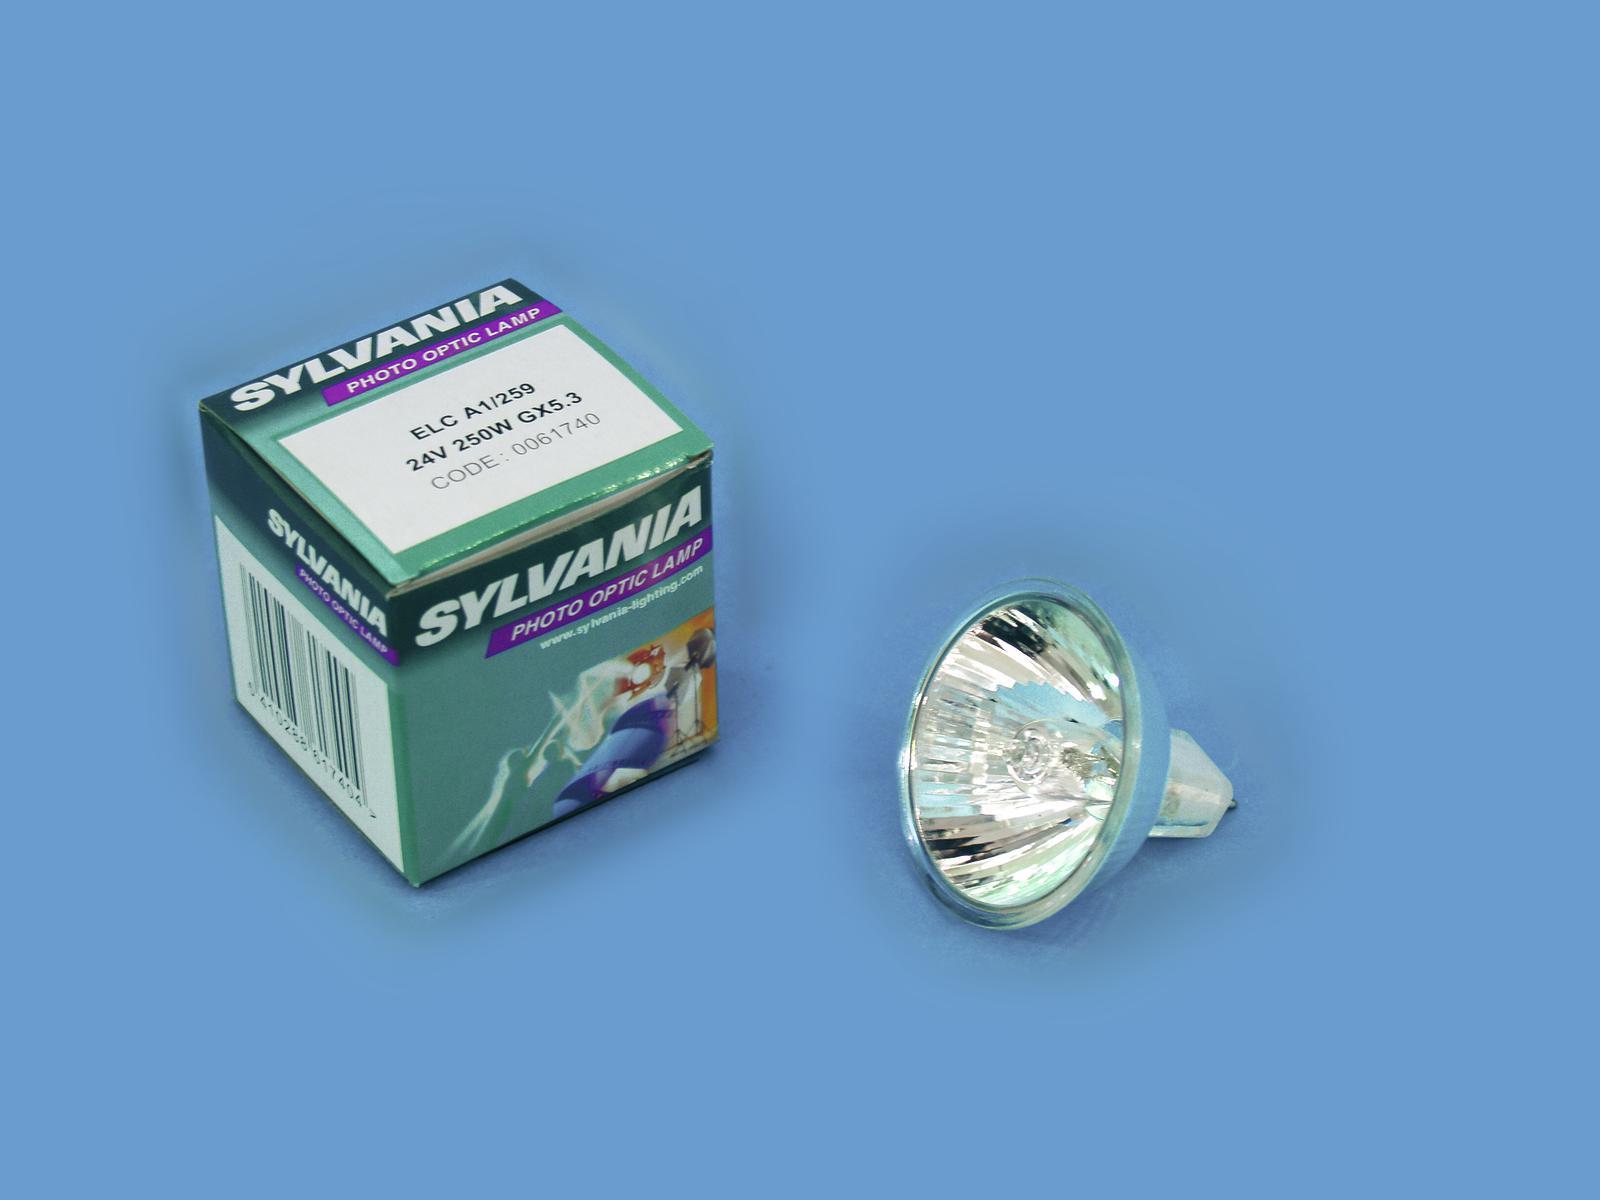 SYLVANIA ELC A1/259 24V/250W GX 5.3 50mm